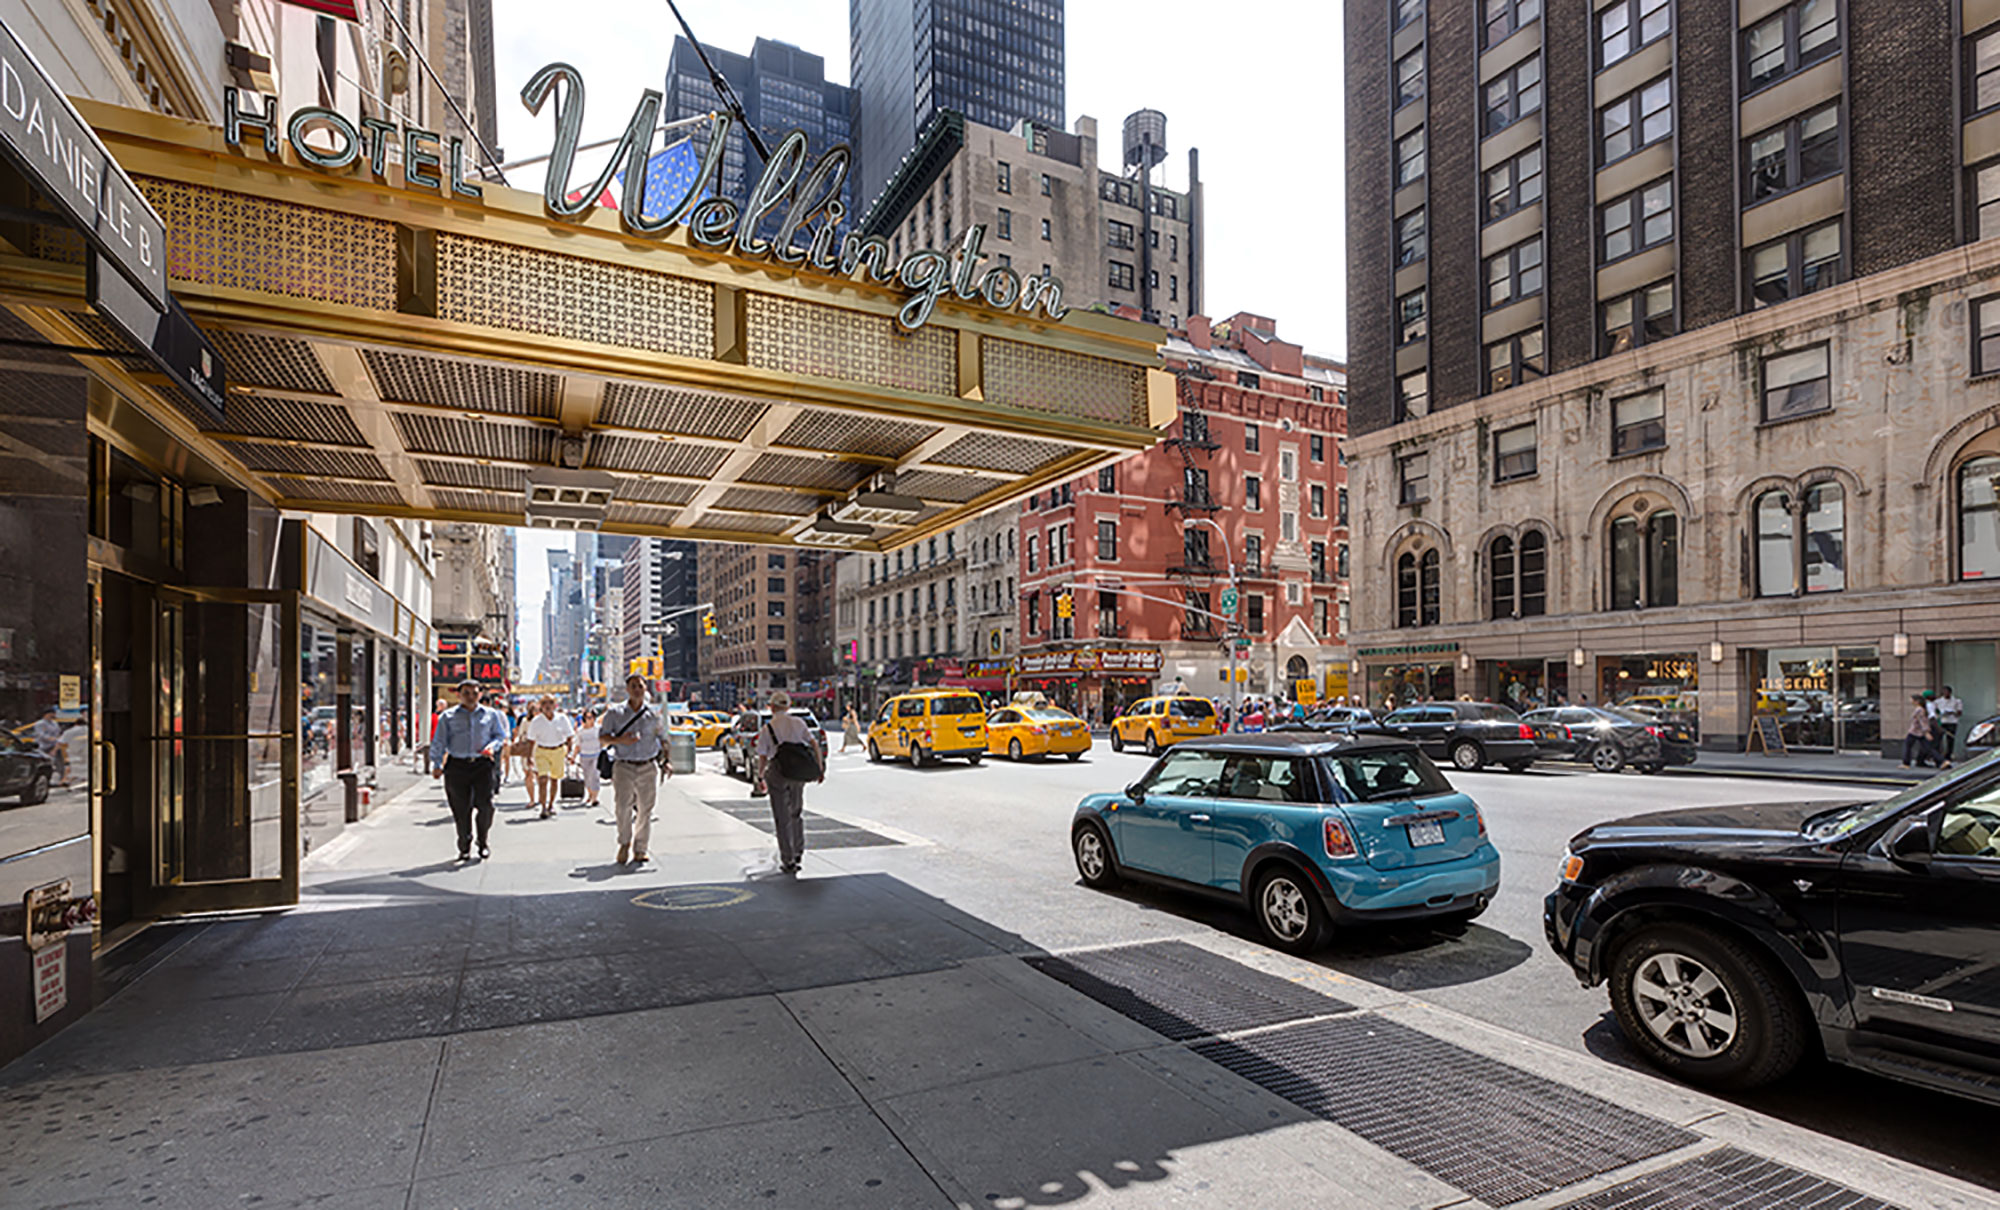 Wellington Hotel New York City | Central Manhattan Hotel